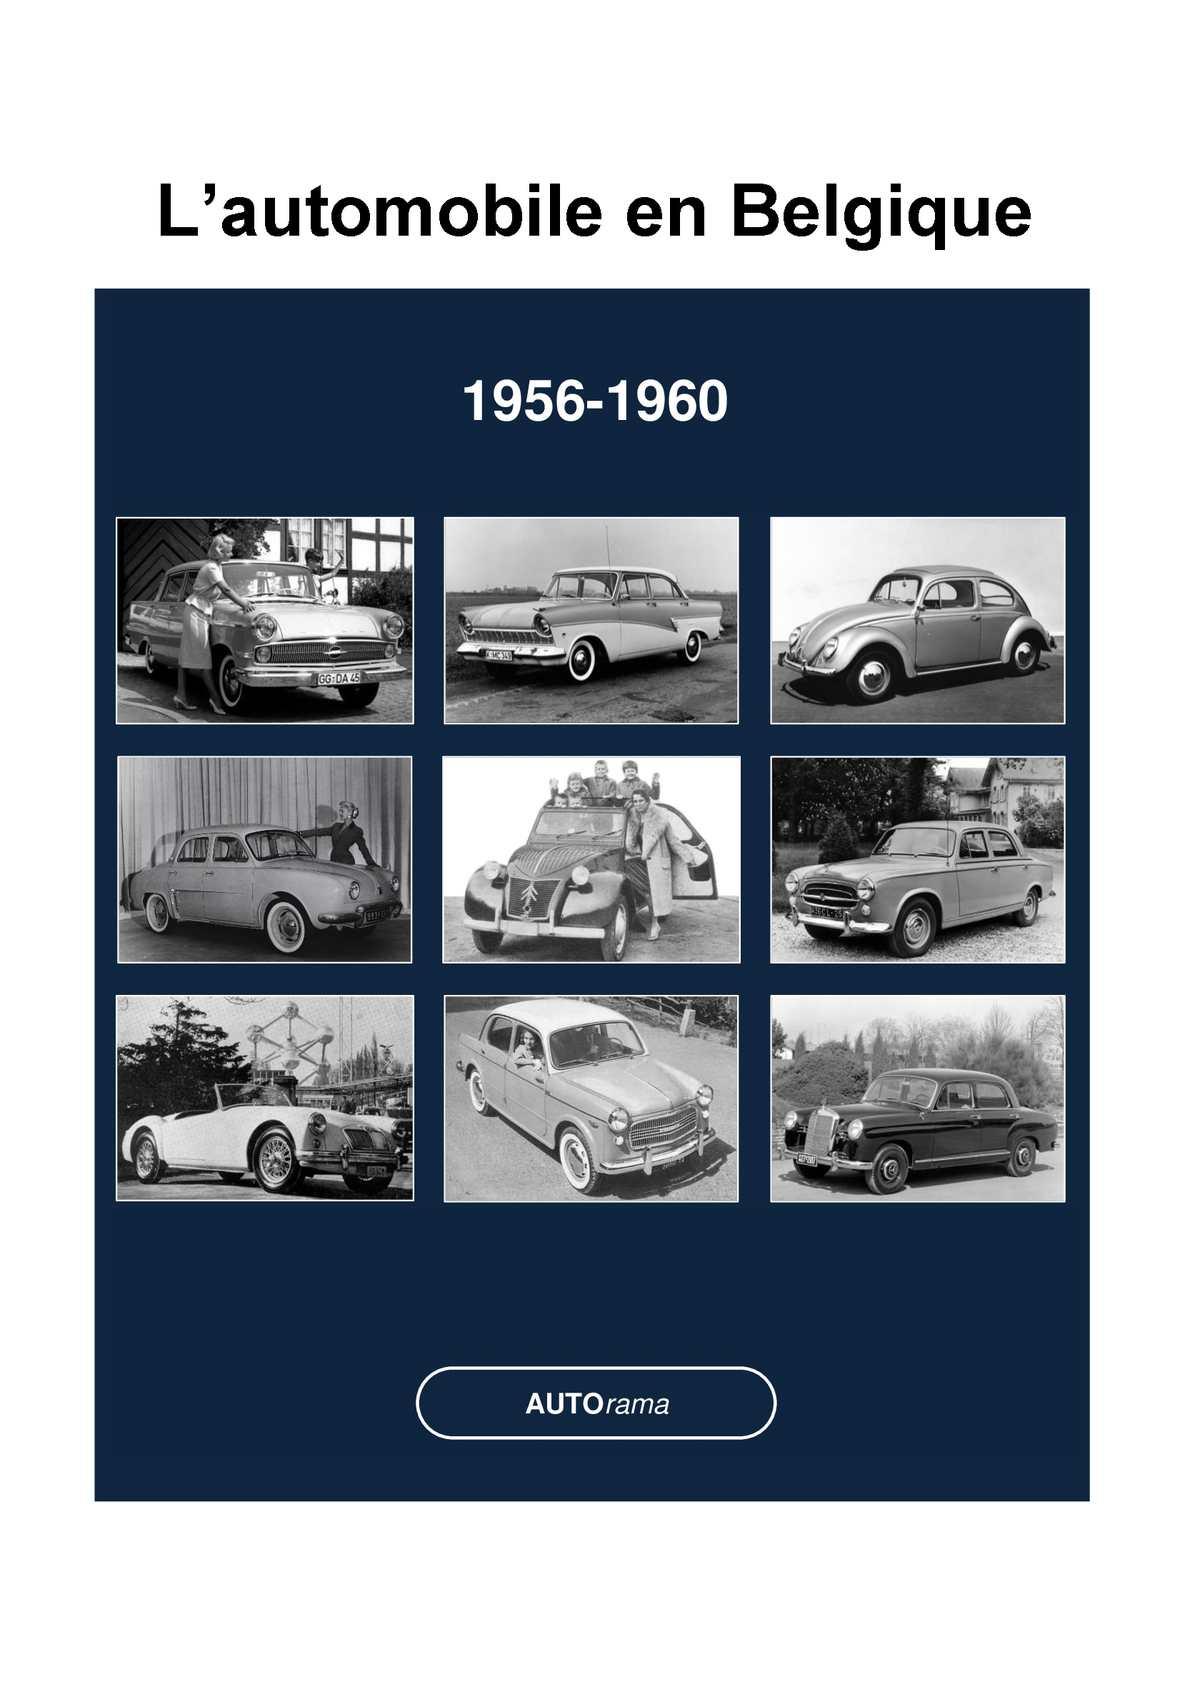 Calam o l 39 automobile en belgique 1956 1960 - Garage automobile en belgique ...